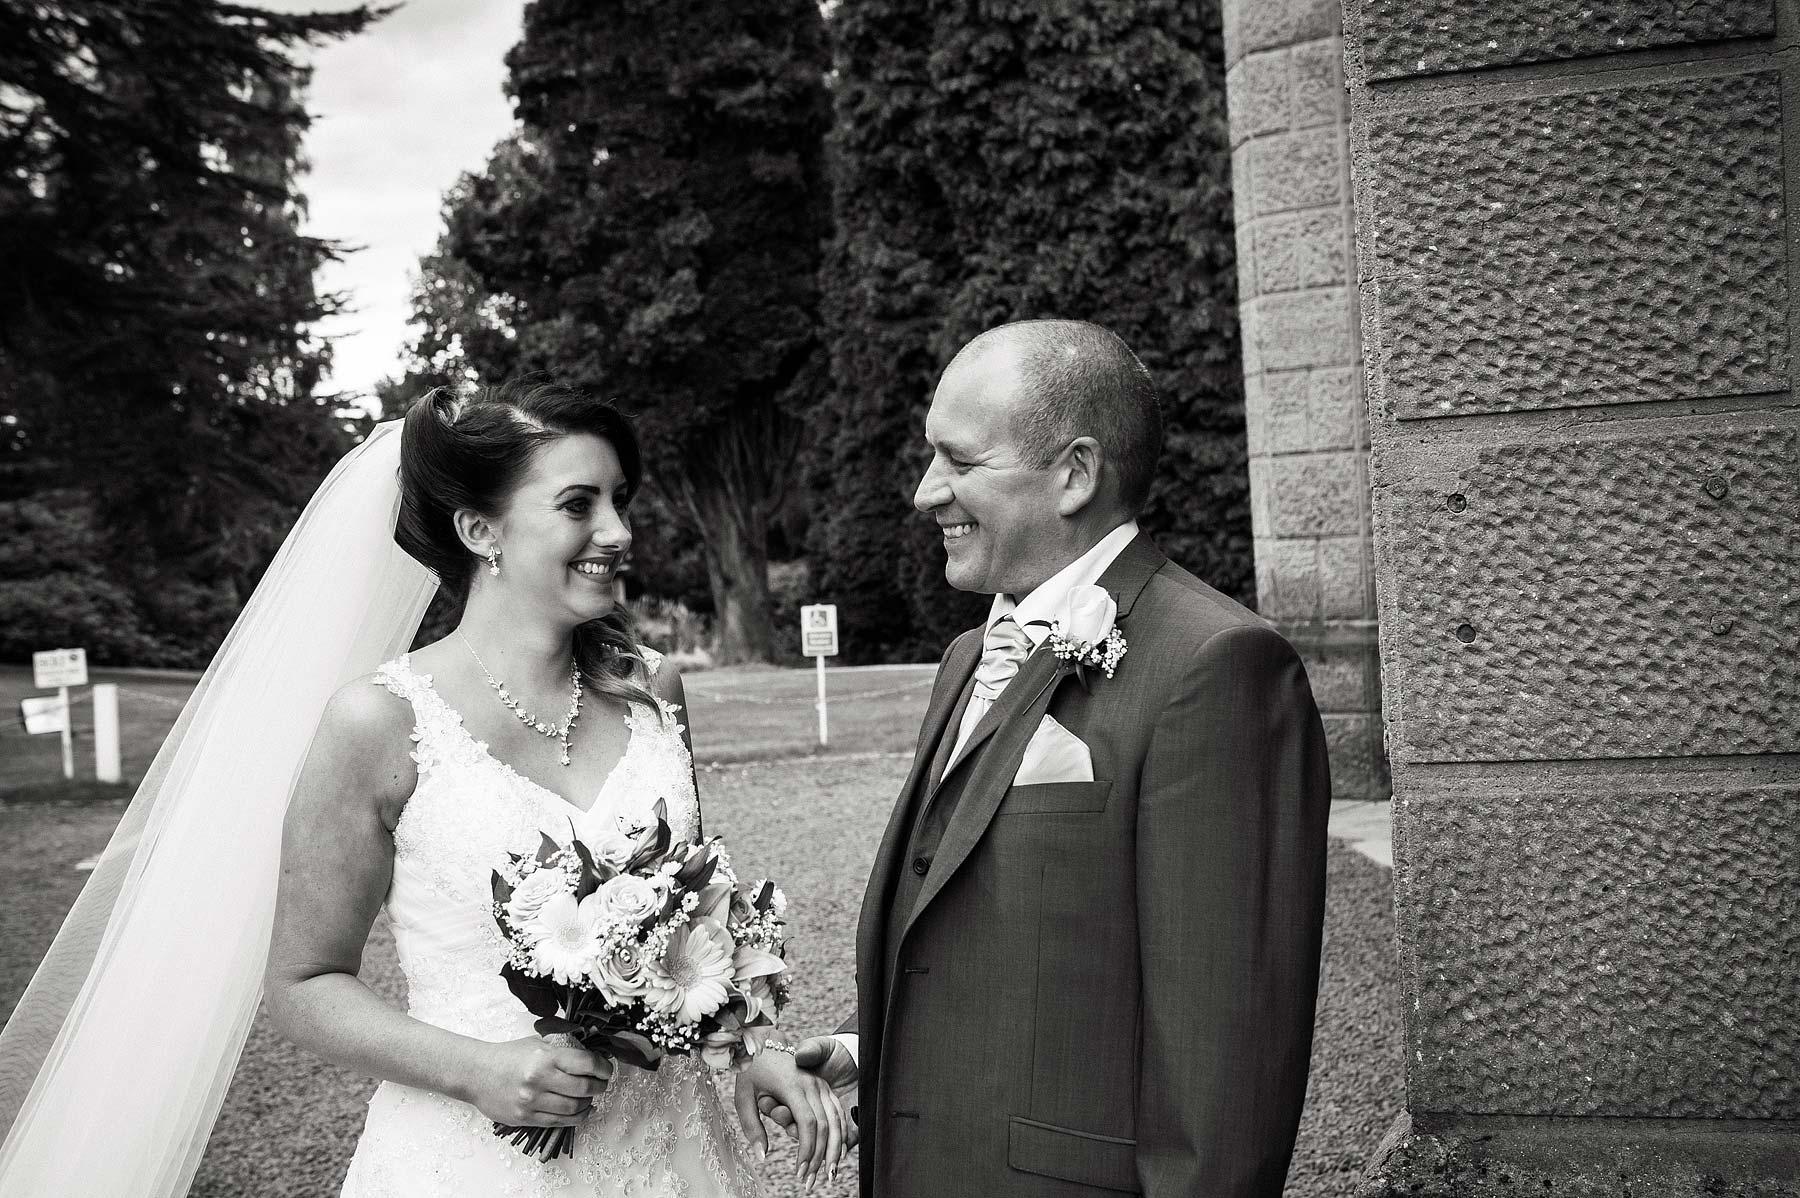 hawkesyard-estate-wedding-photographers-rugeley-026